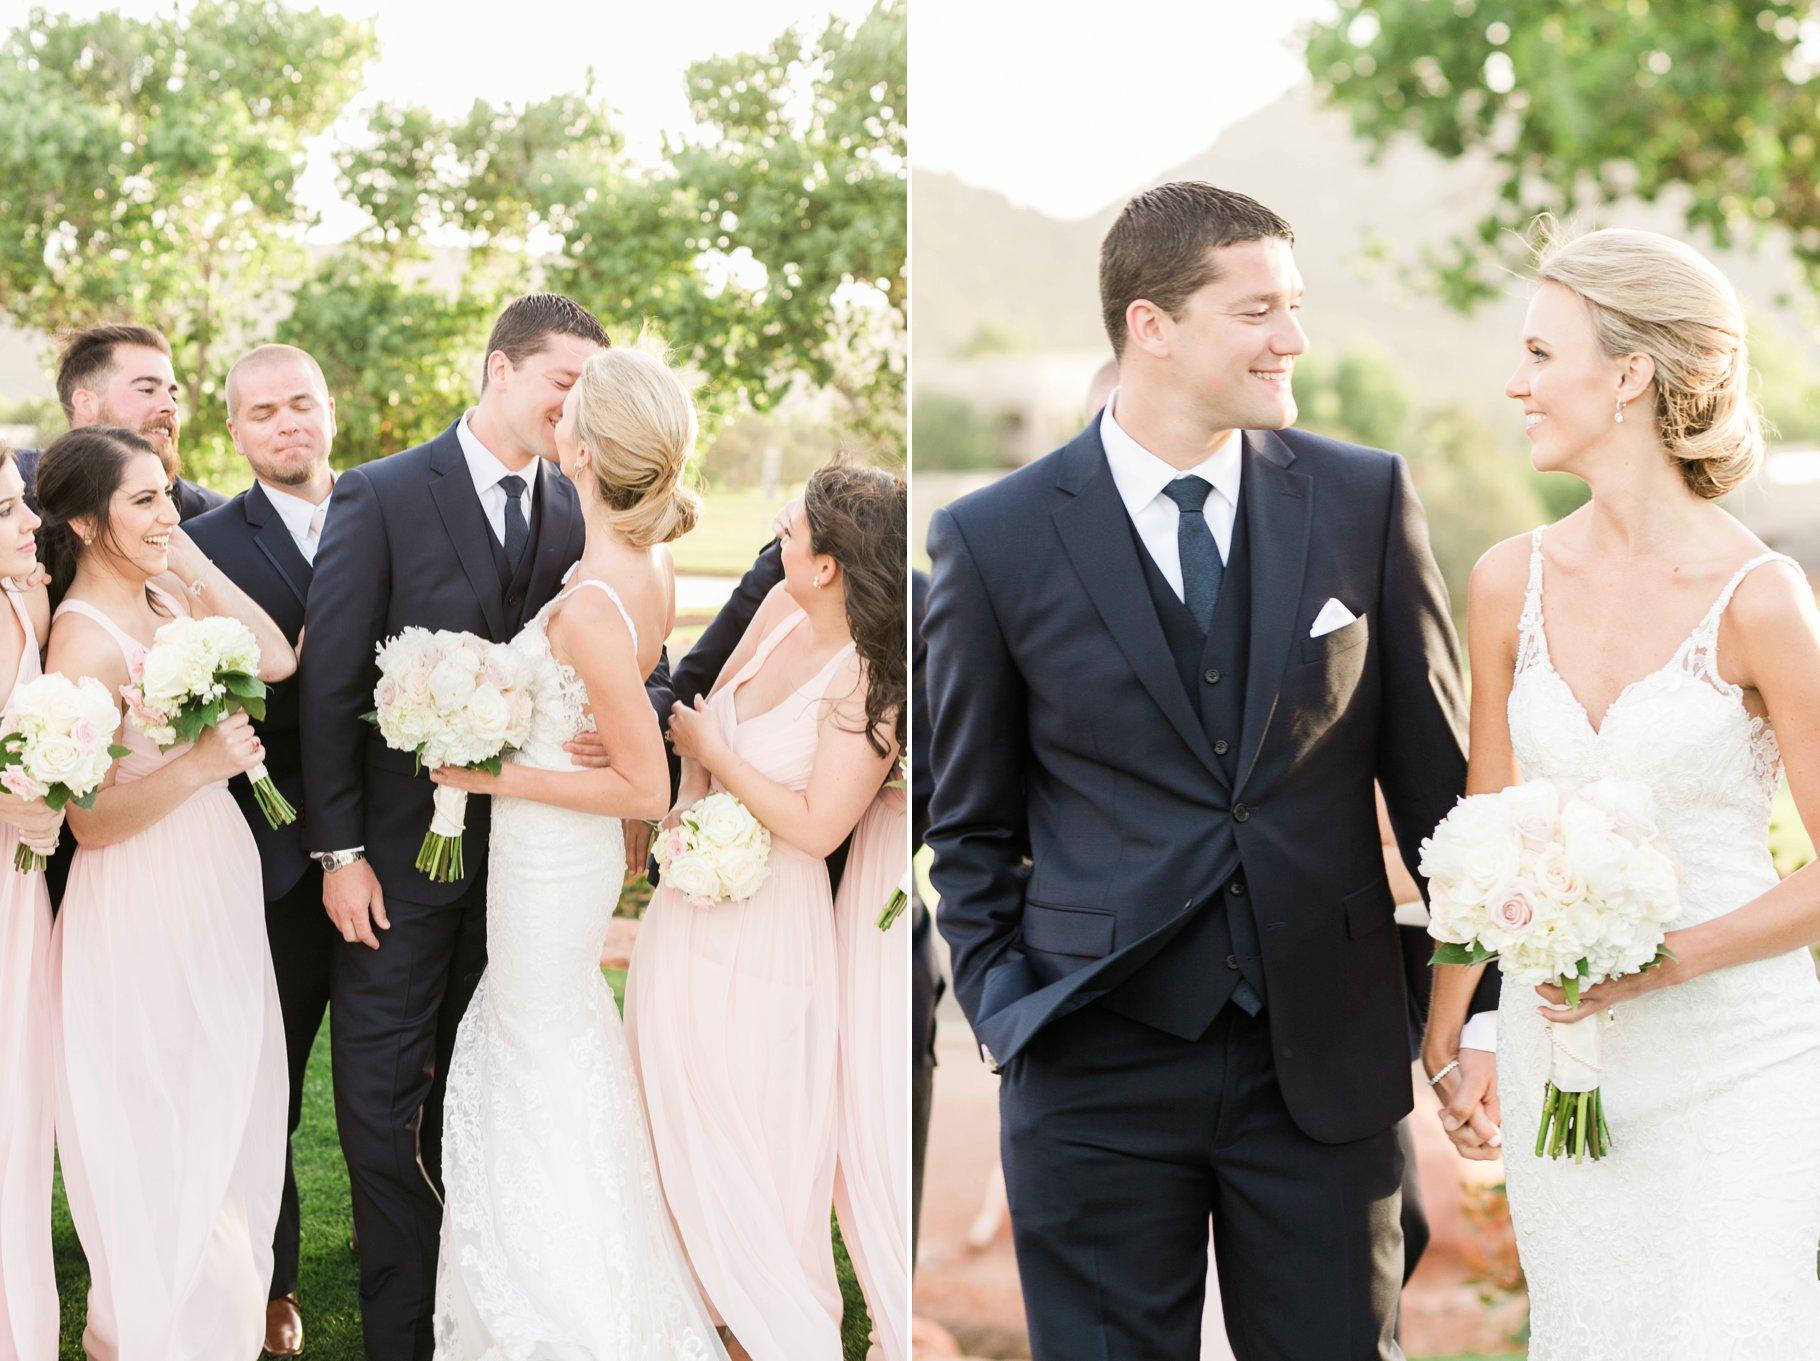 sedona wedding-21_GRETCHEN WAKEMAN PHOTOGRAPHY.jpg